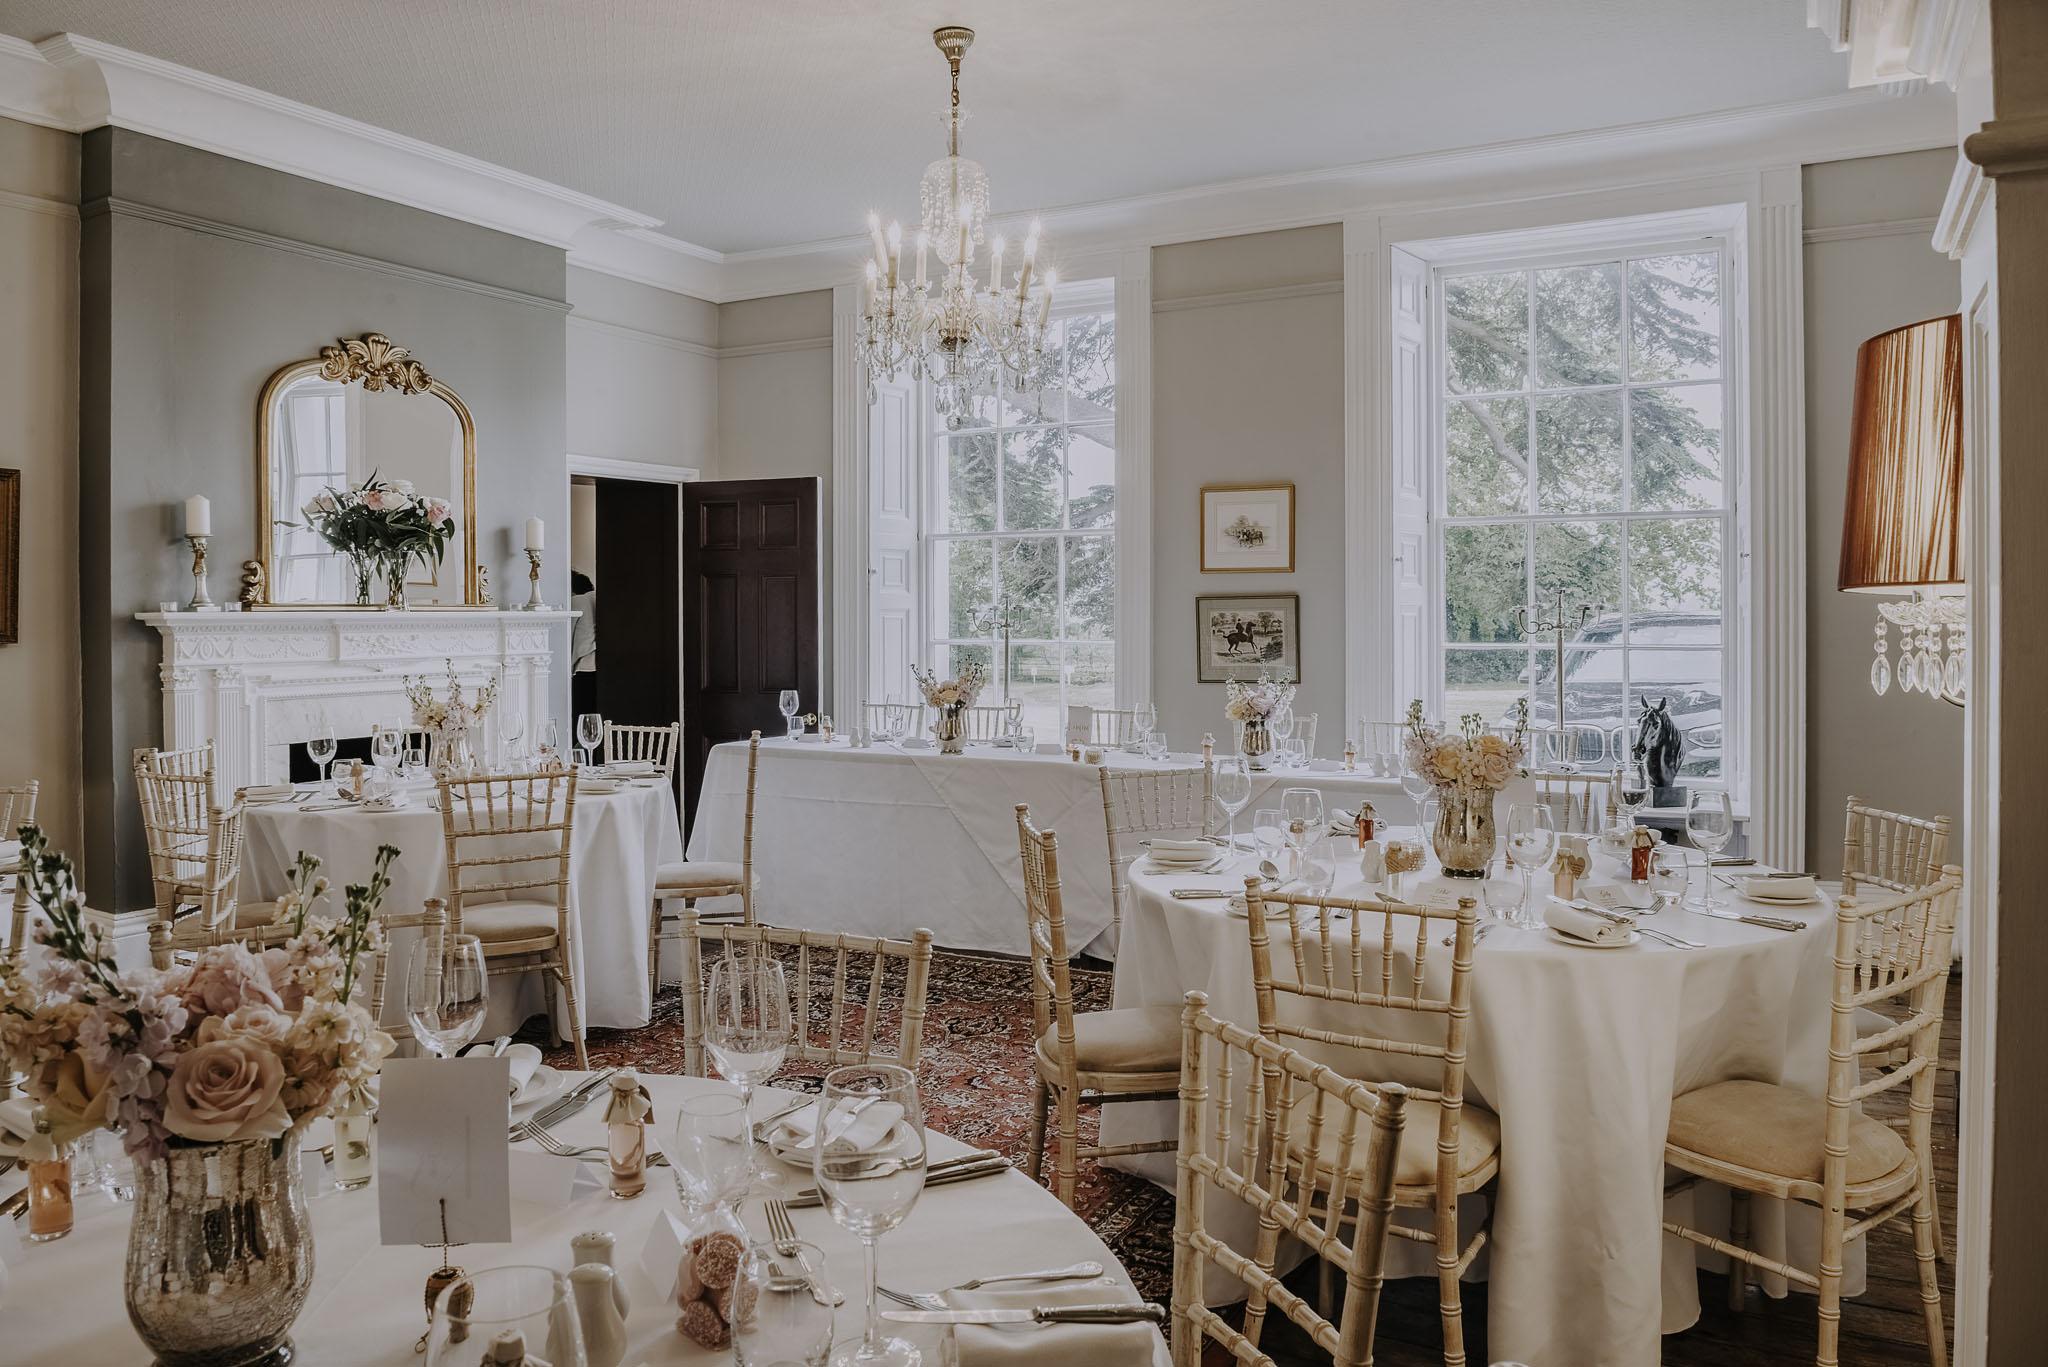 wedding-photographer-glewstone-court-hereford-scott-stockwell-photography366.jpg